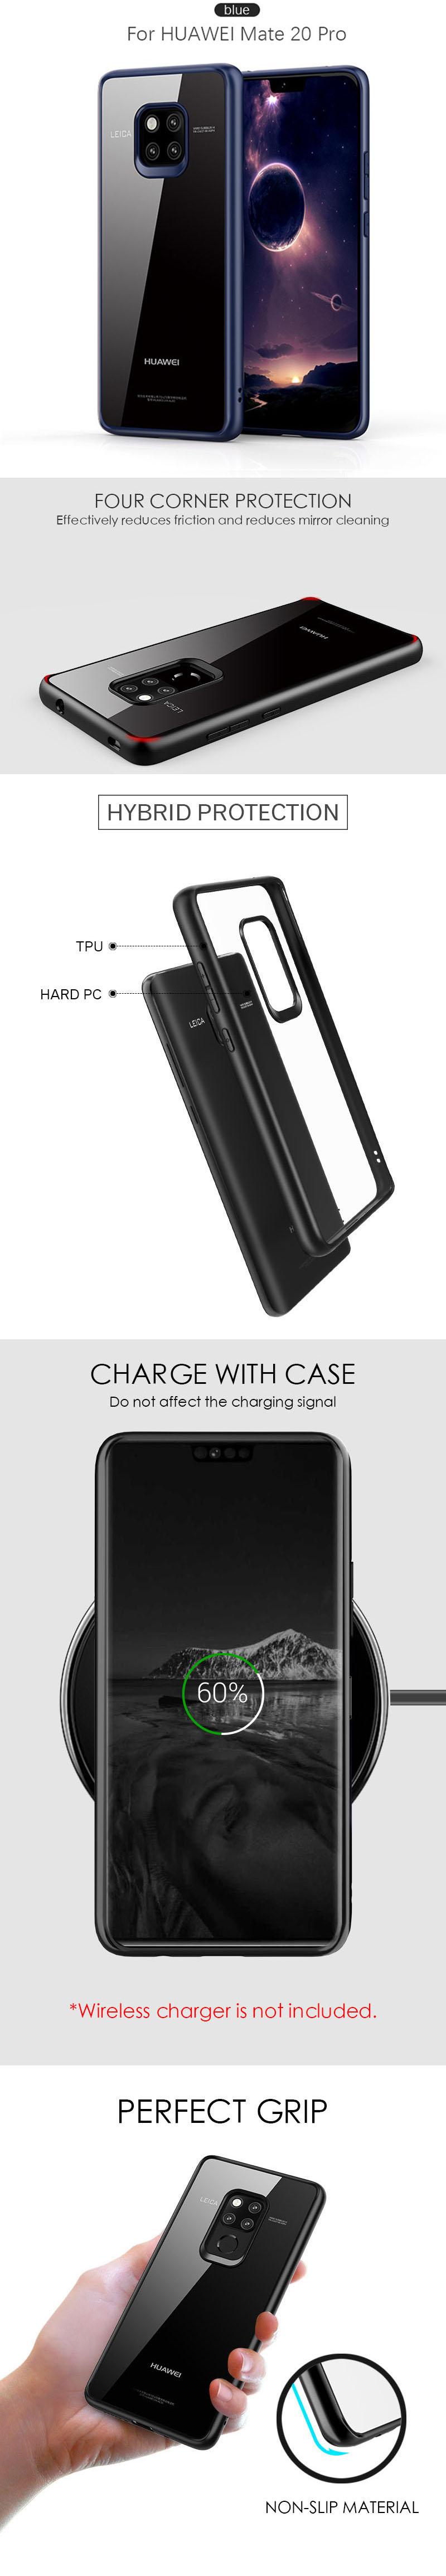 case090-2.jpg